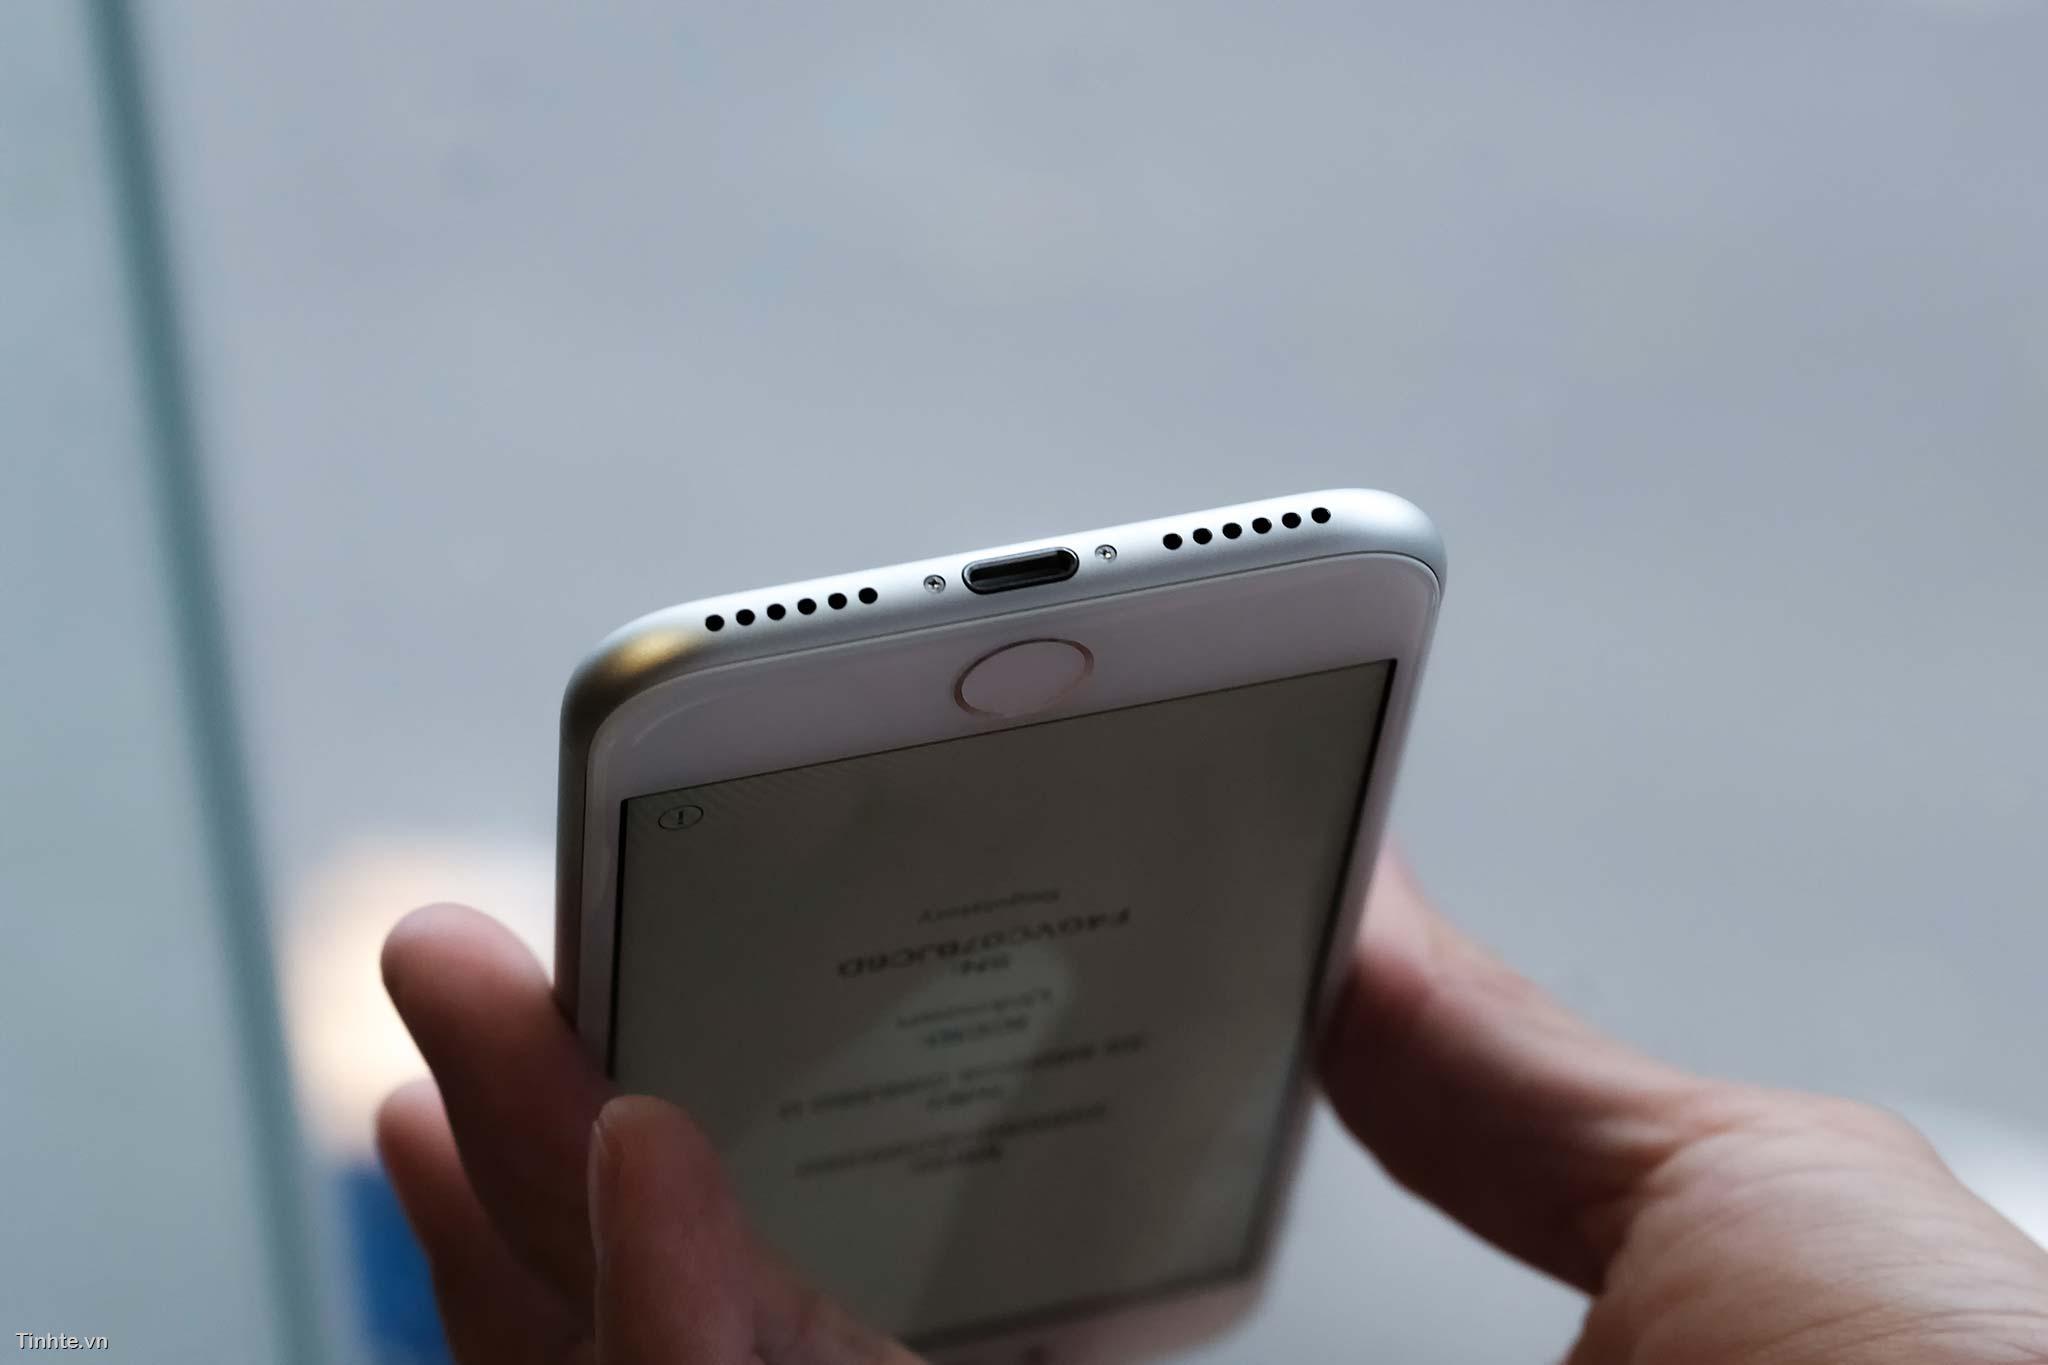 tinhte_tren_tay_apple_iphone_8_iphone8_plus8.jpg